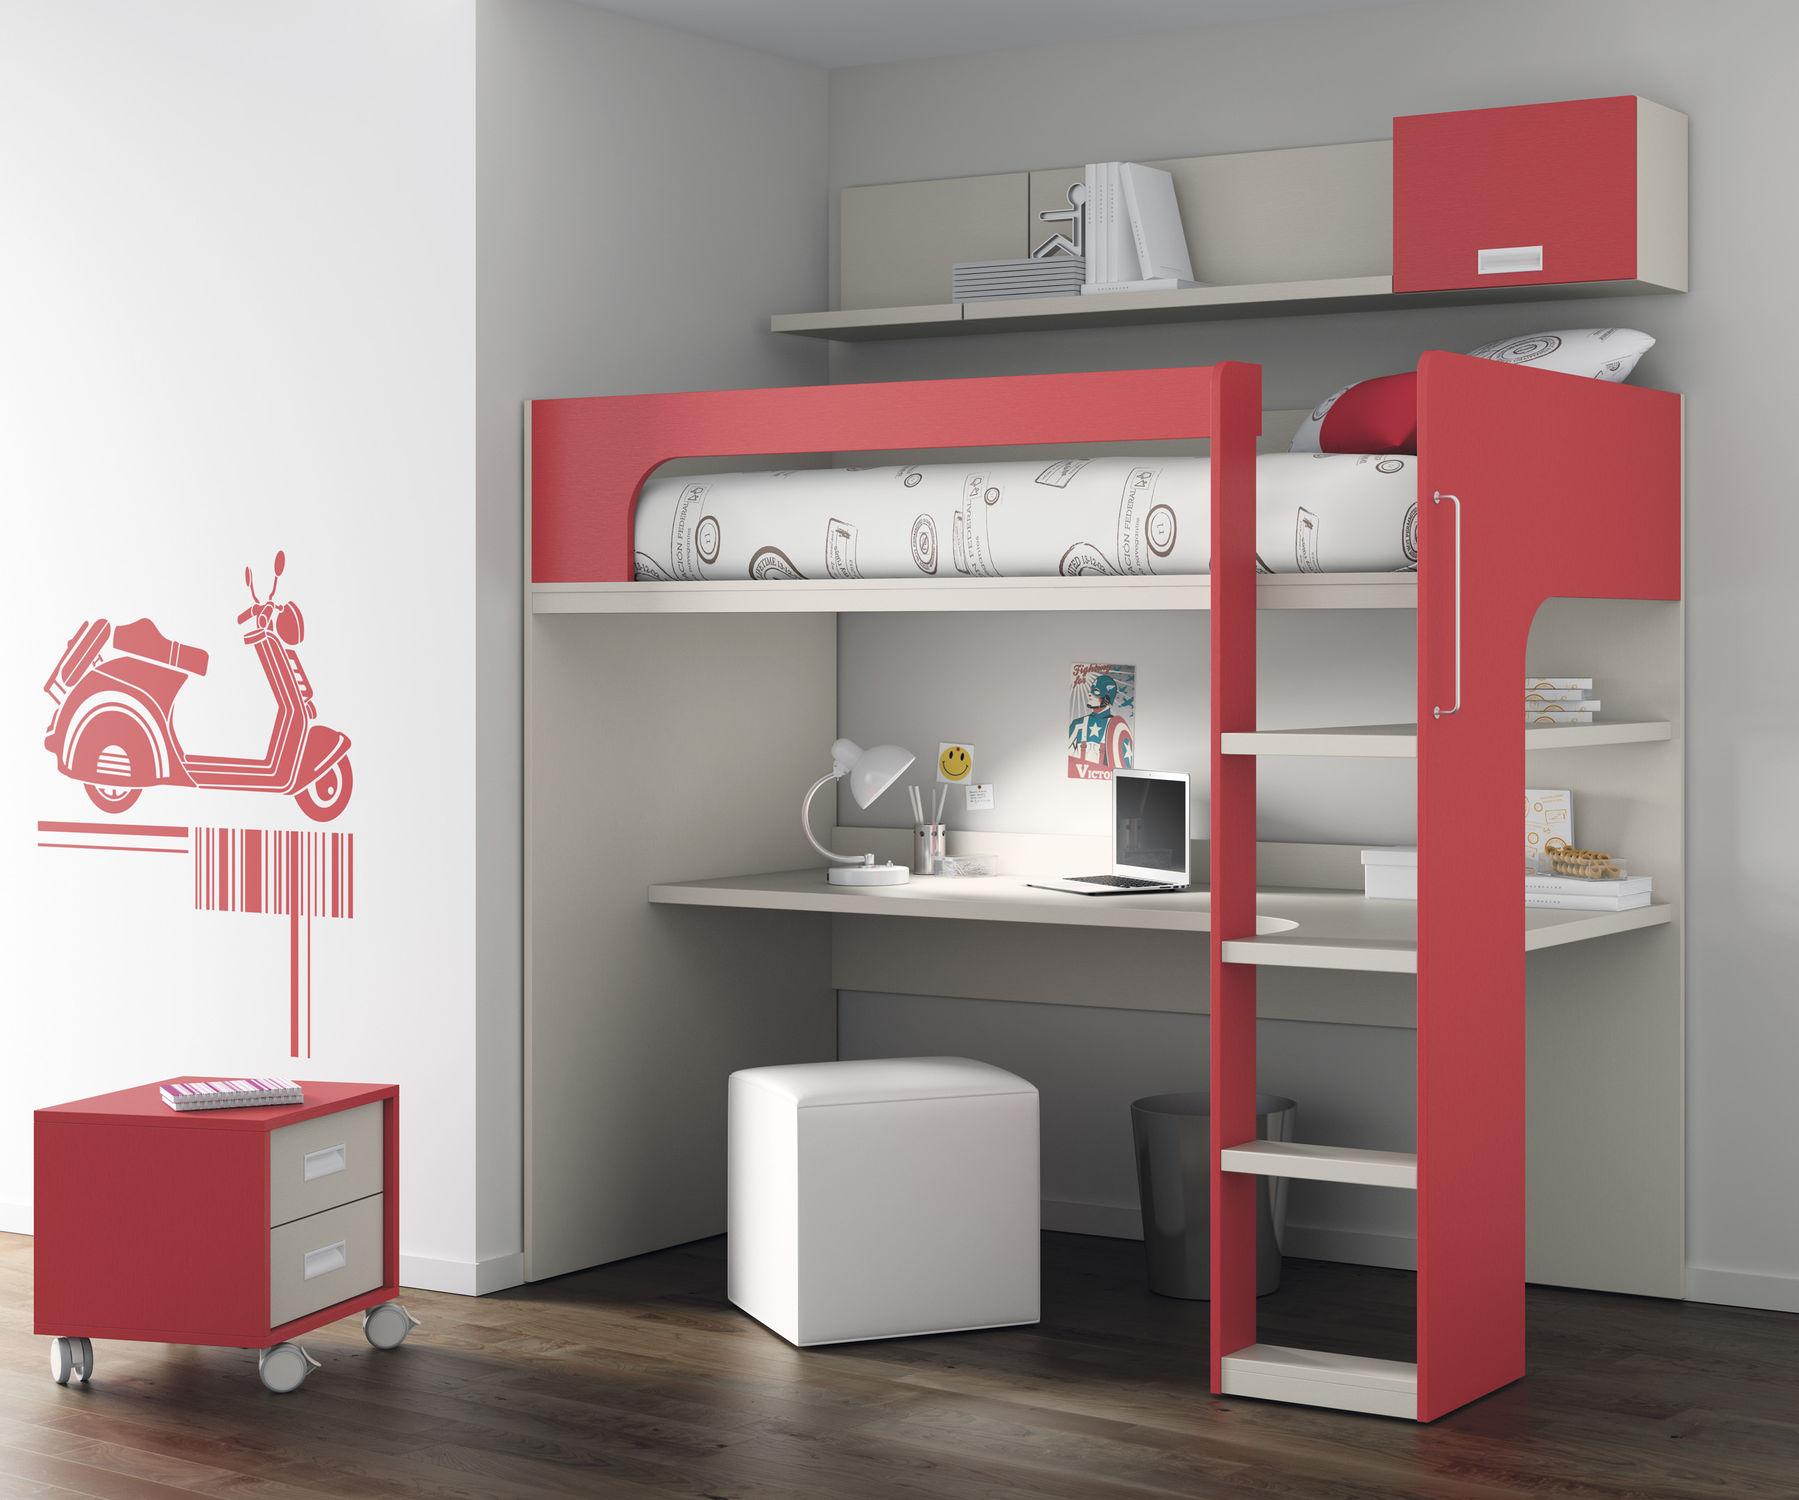 Fonkelnieuw Loft bed / single / contemporary / child's unisex - TOUCH 69 - ROS XK-73